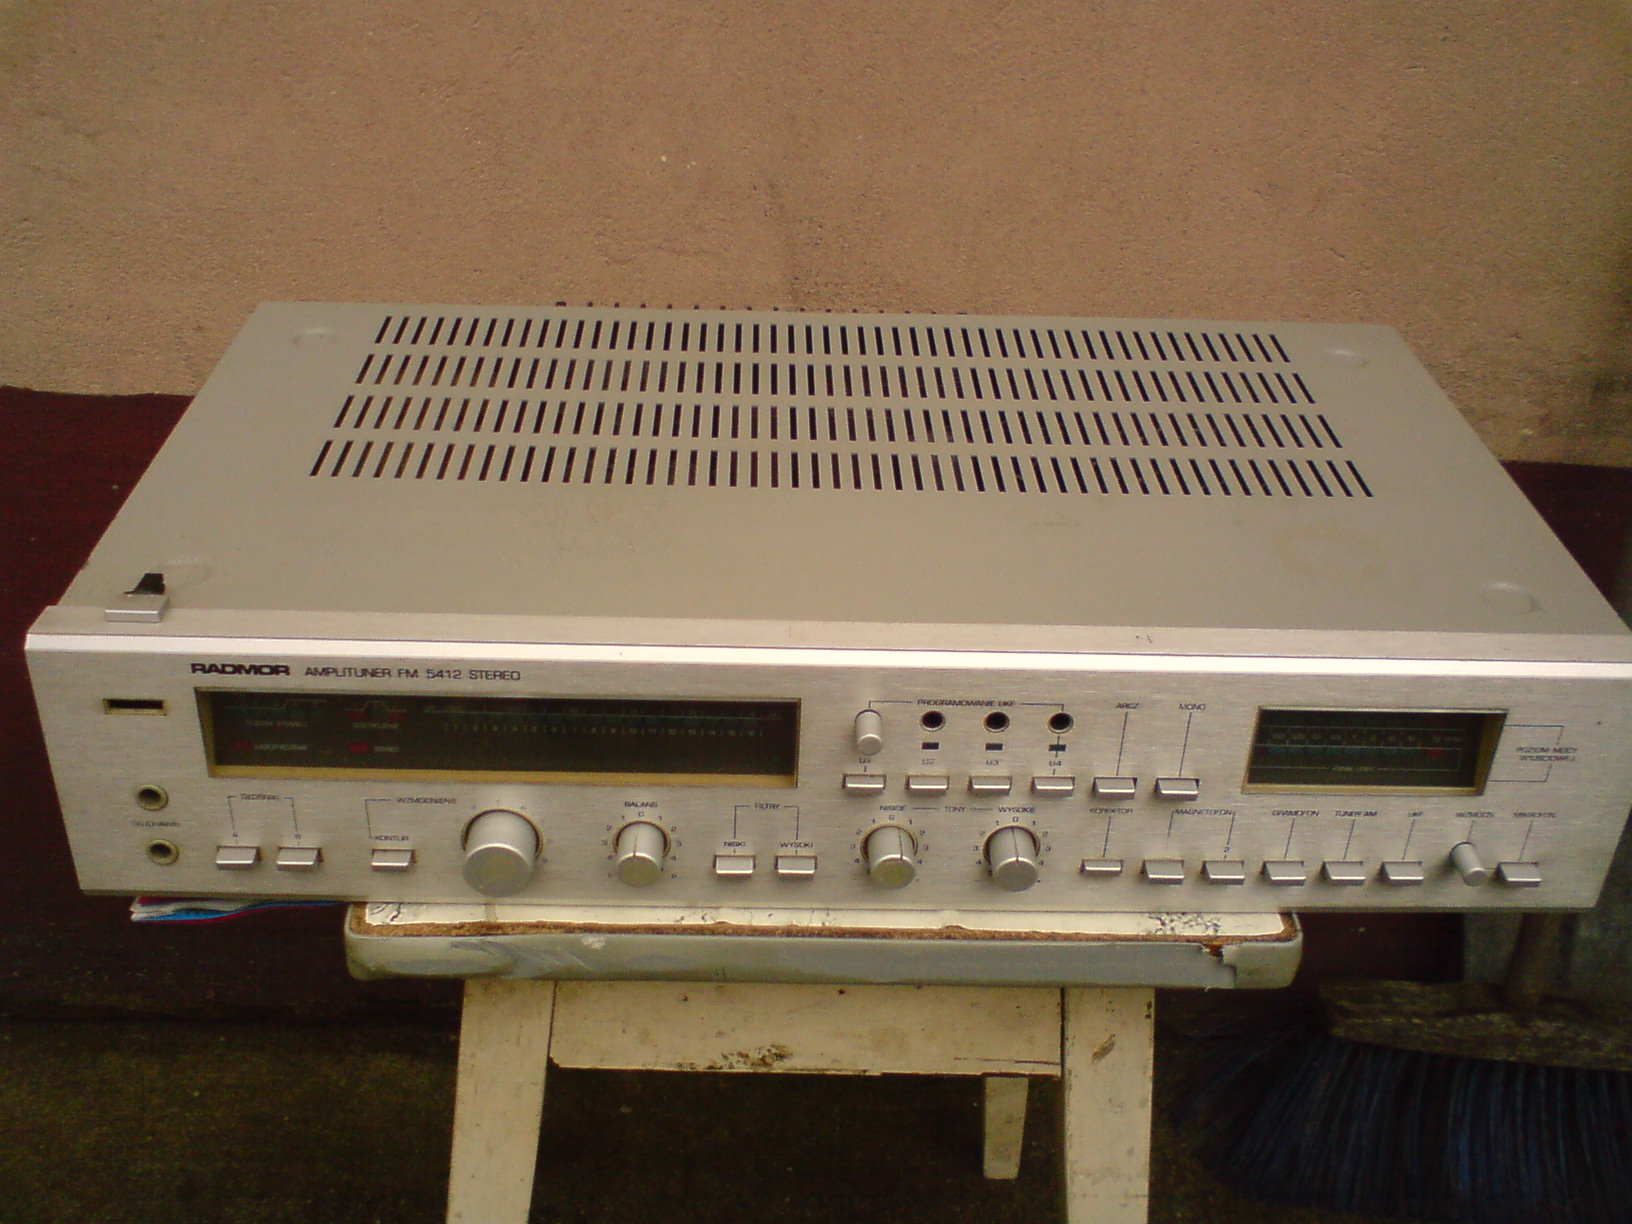 [Zamieni�] Amplituner Radmor 5412 na korektor